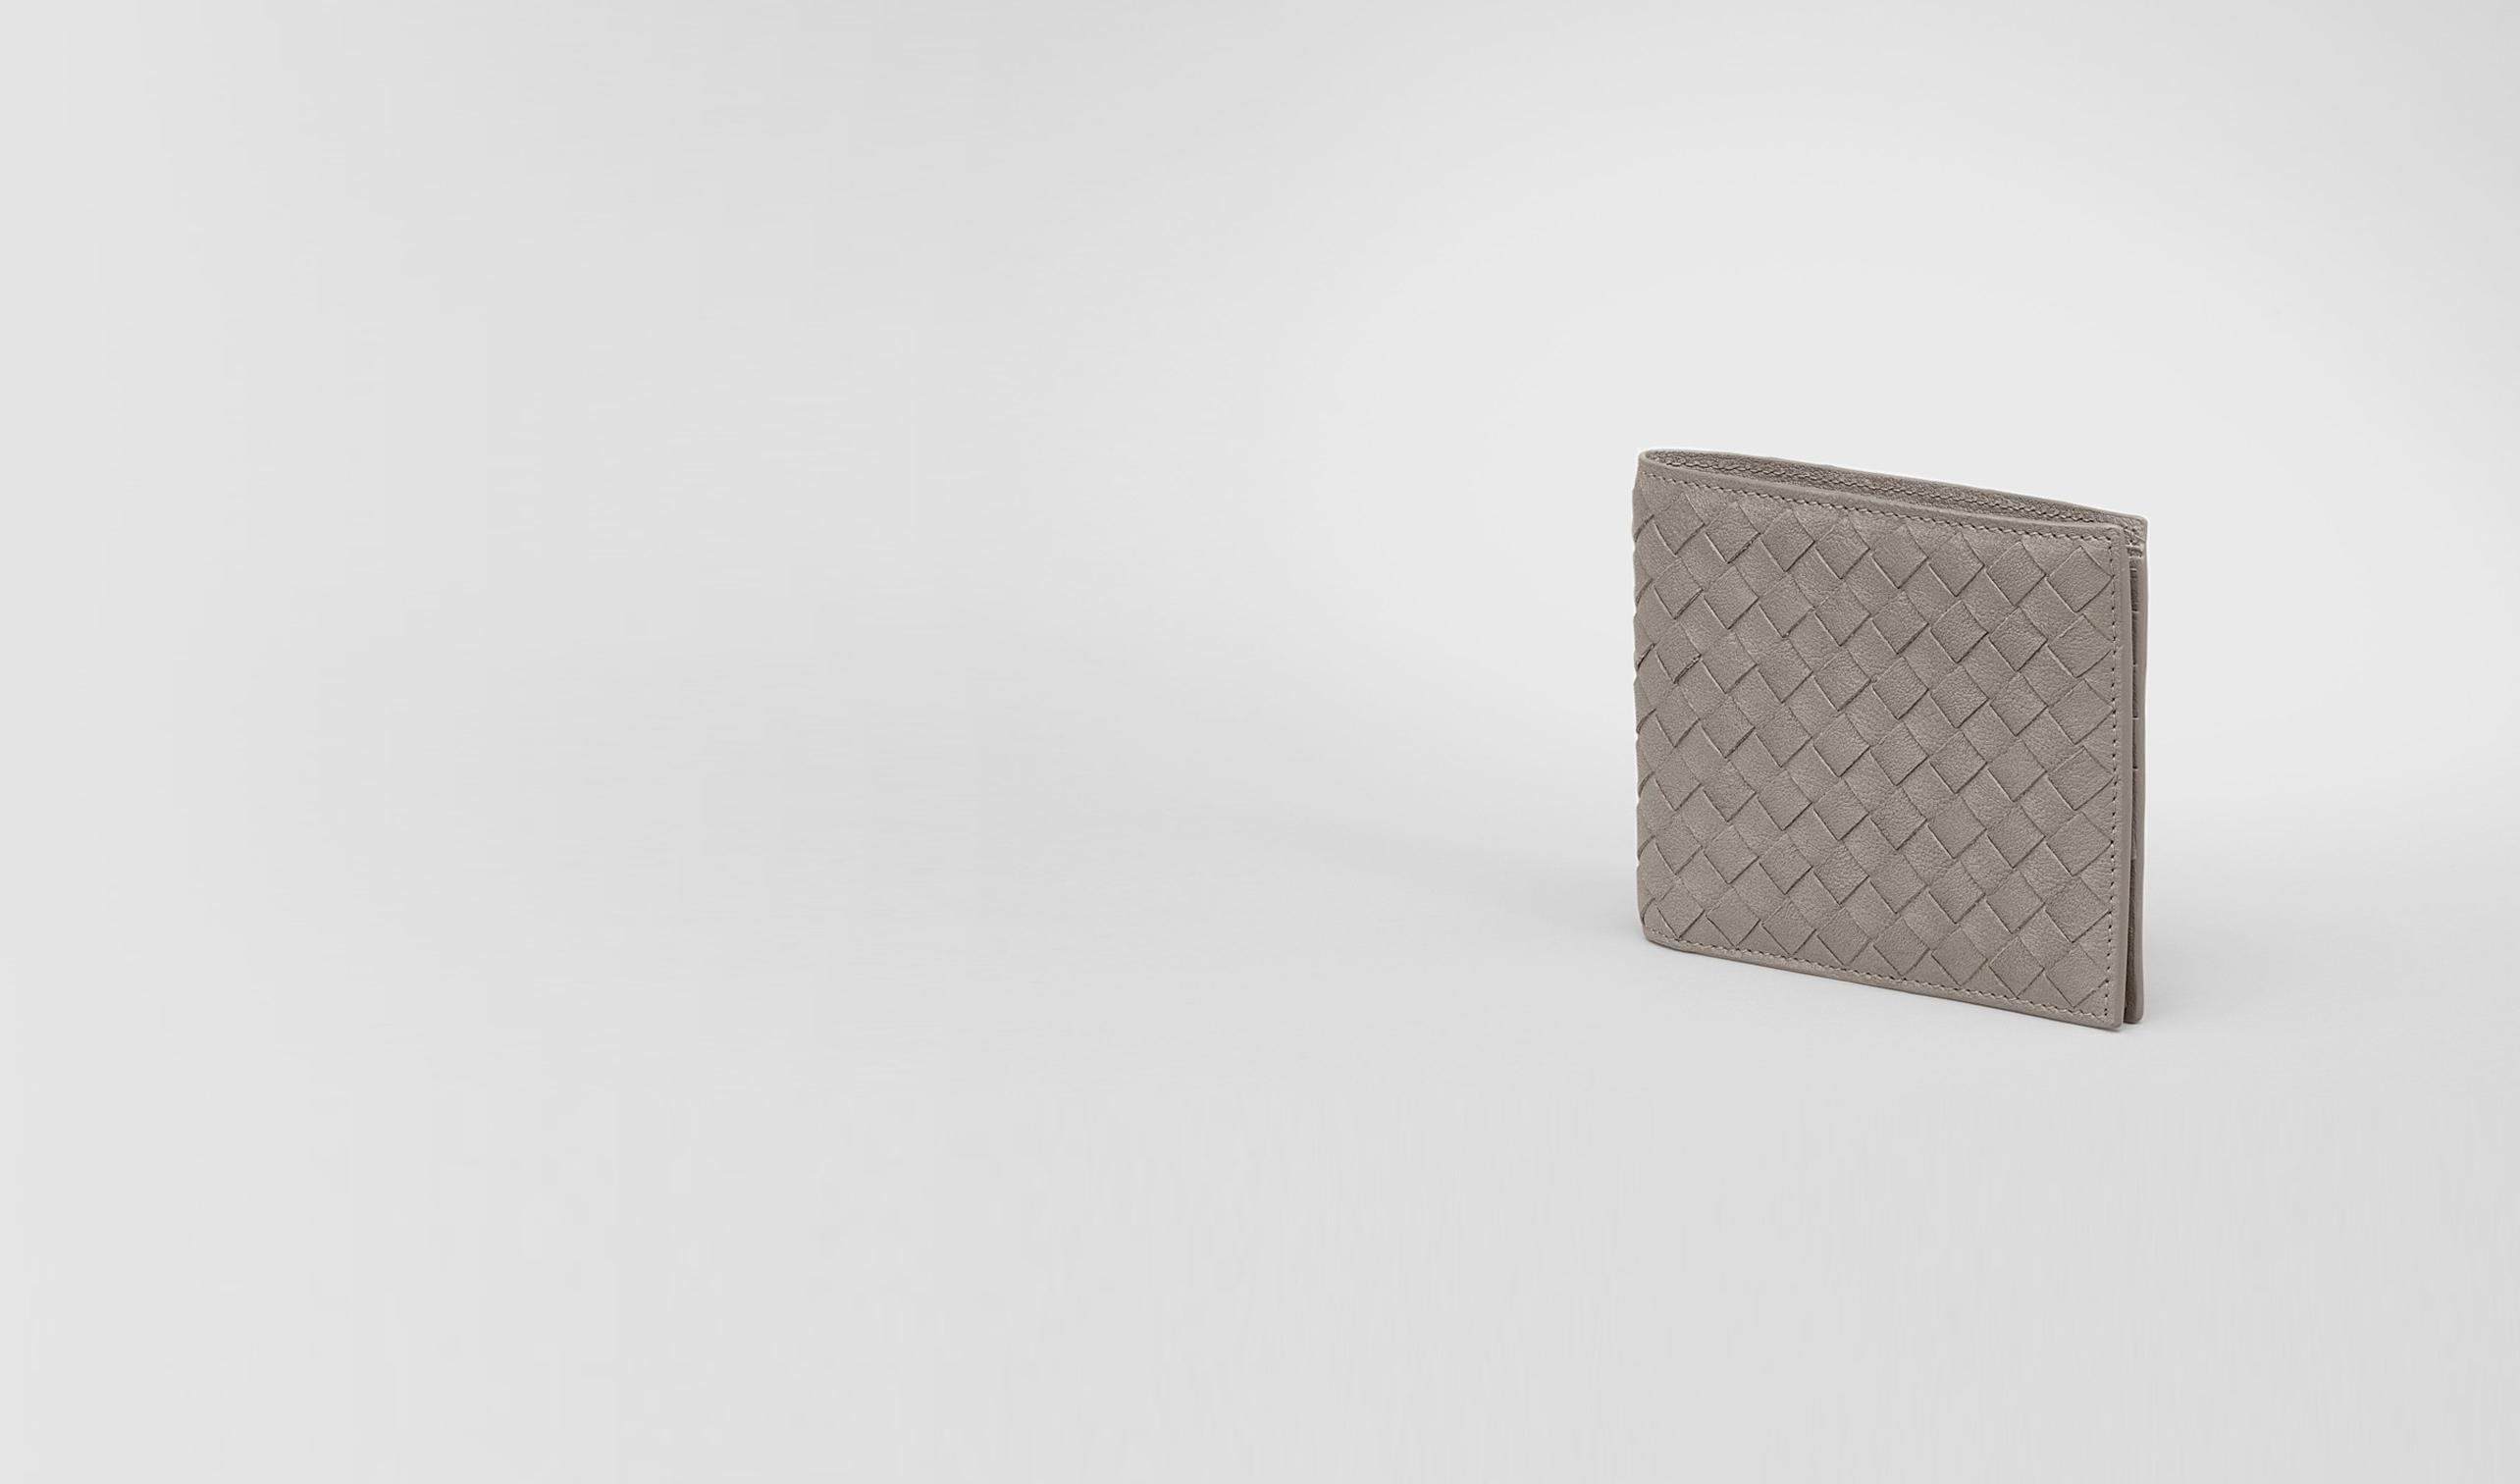 BOTTEGA VENETA Faltbares Portemonnaie U Portemonnaie aus gewaschenem Lammleder Intrecciato Fume pl